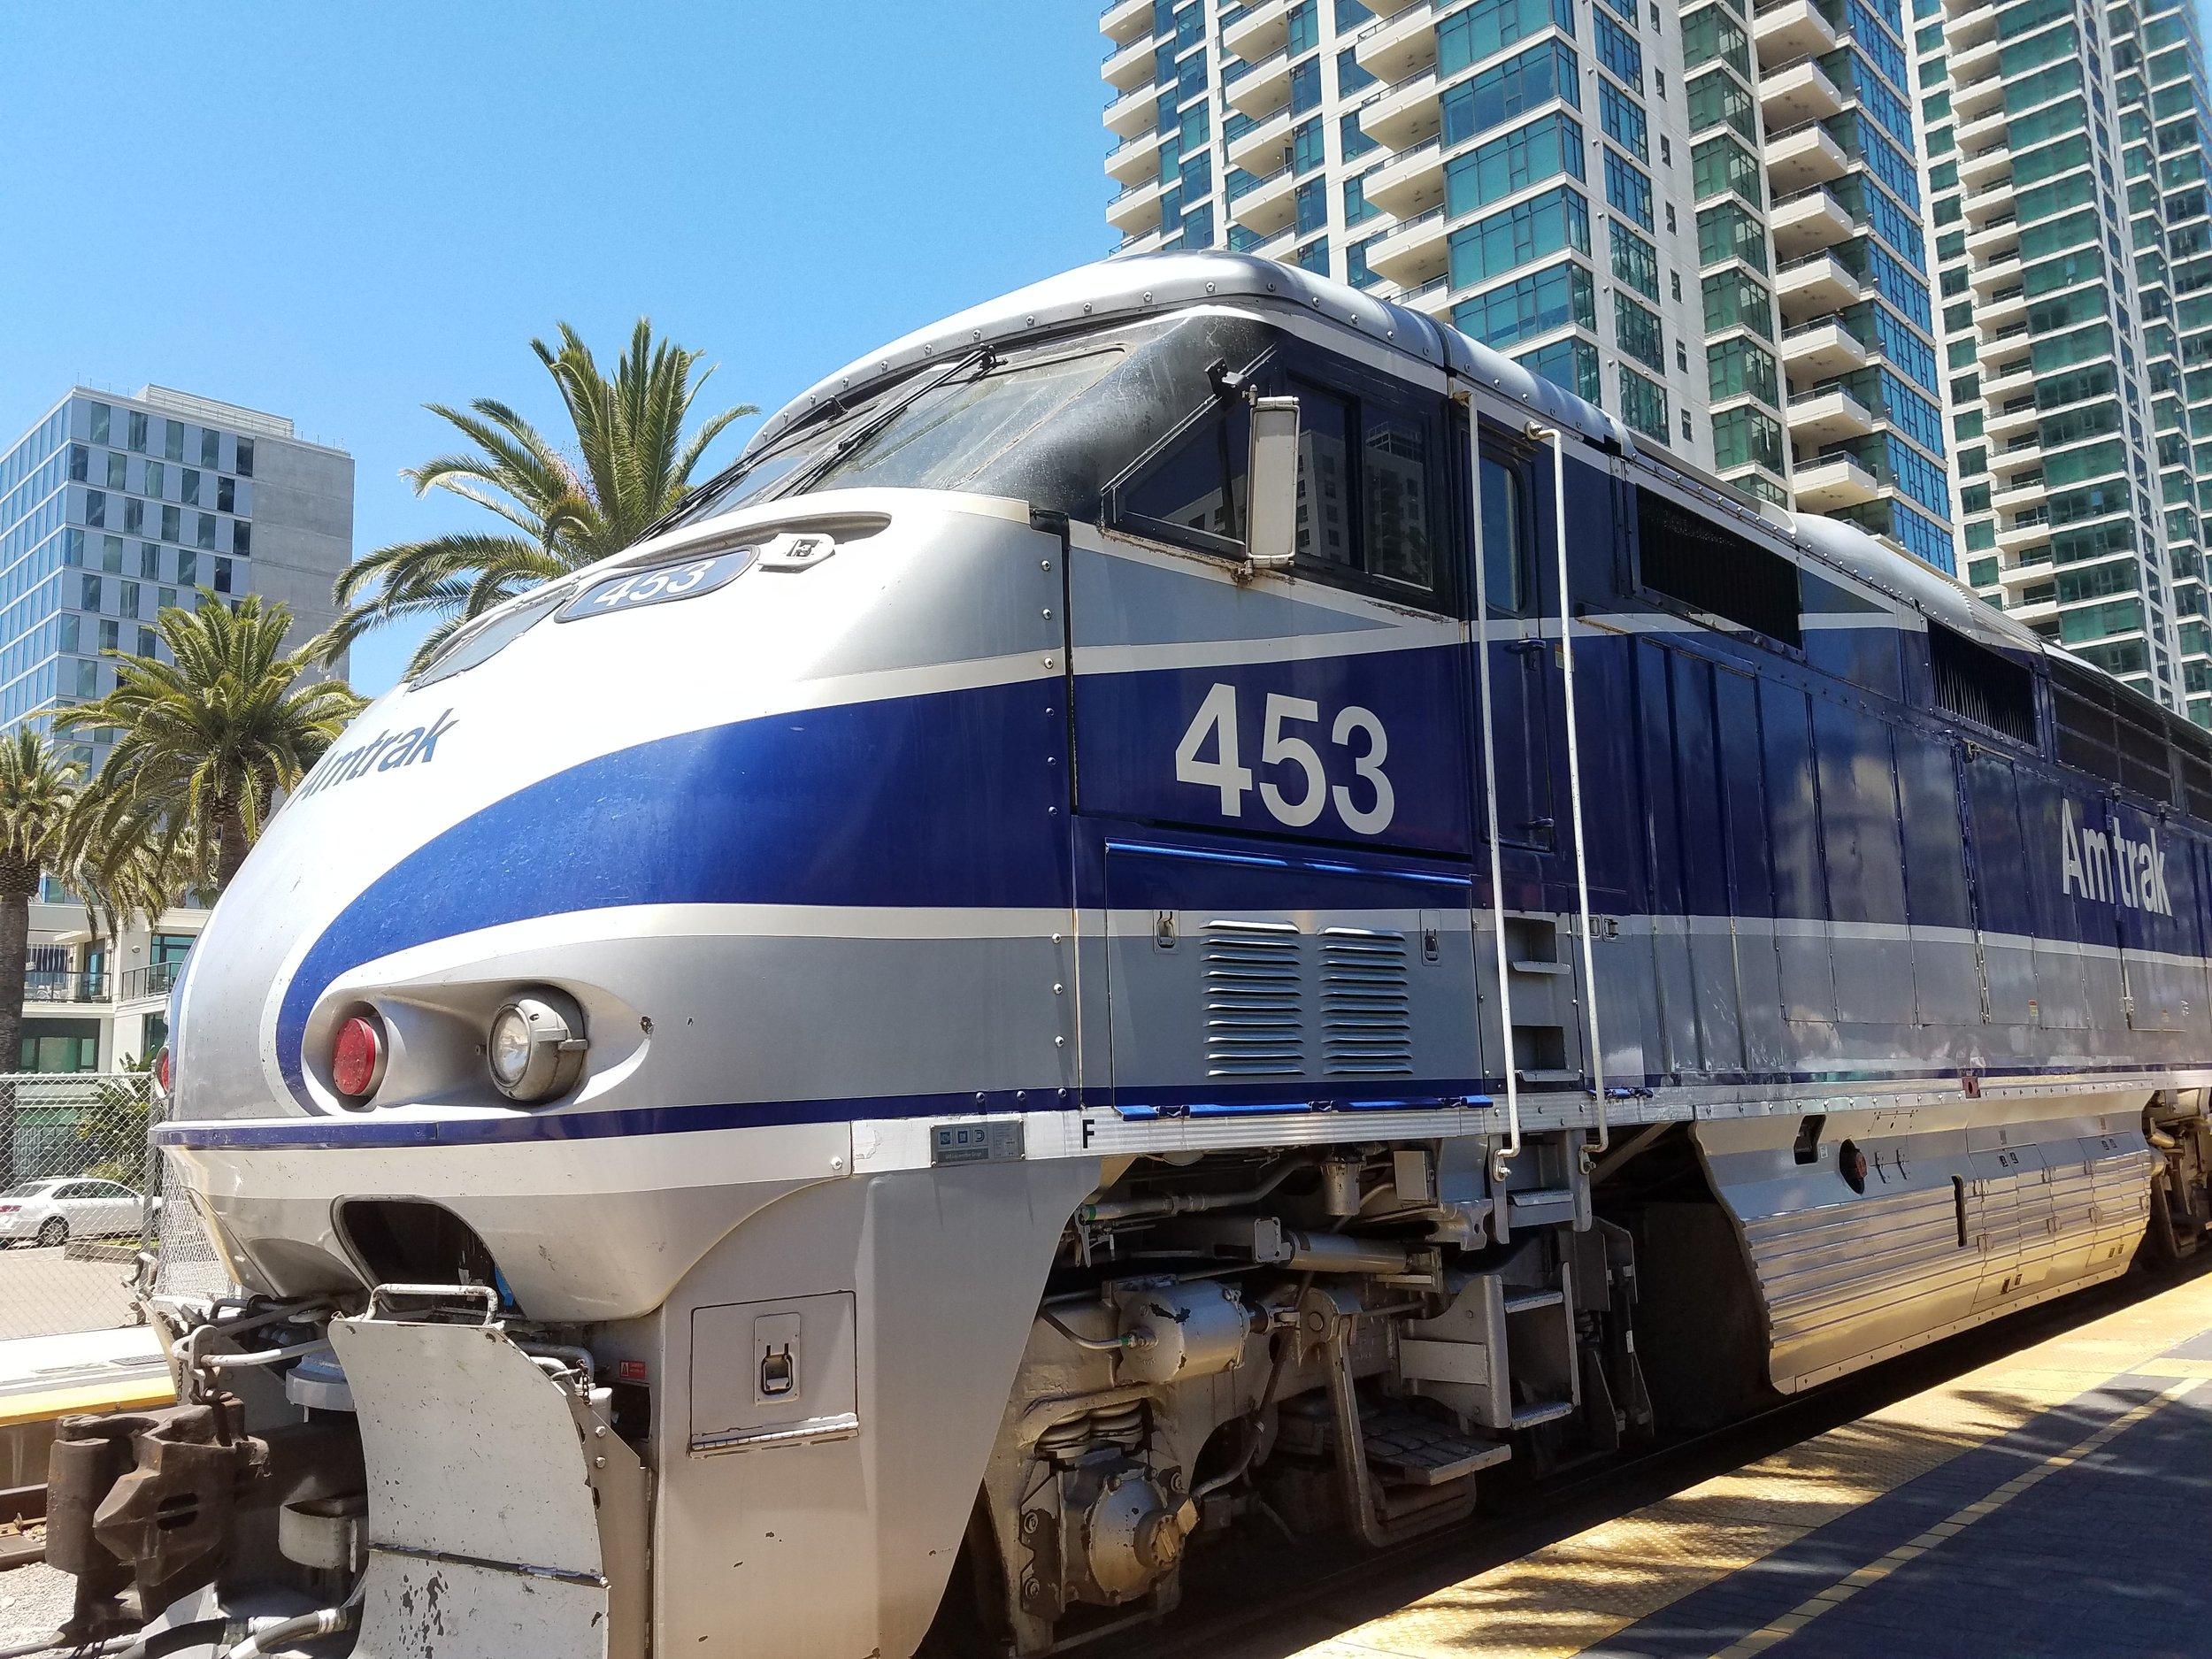 Amtrak in SD